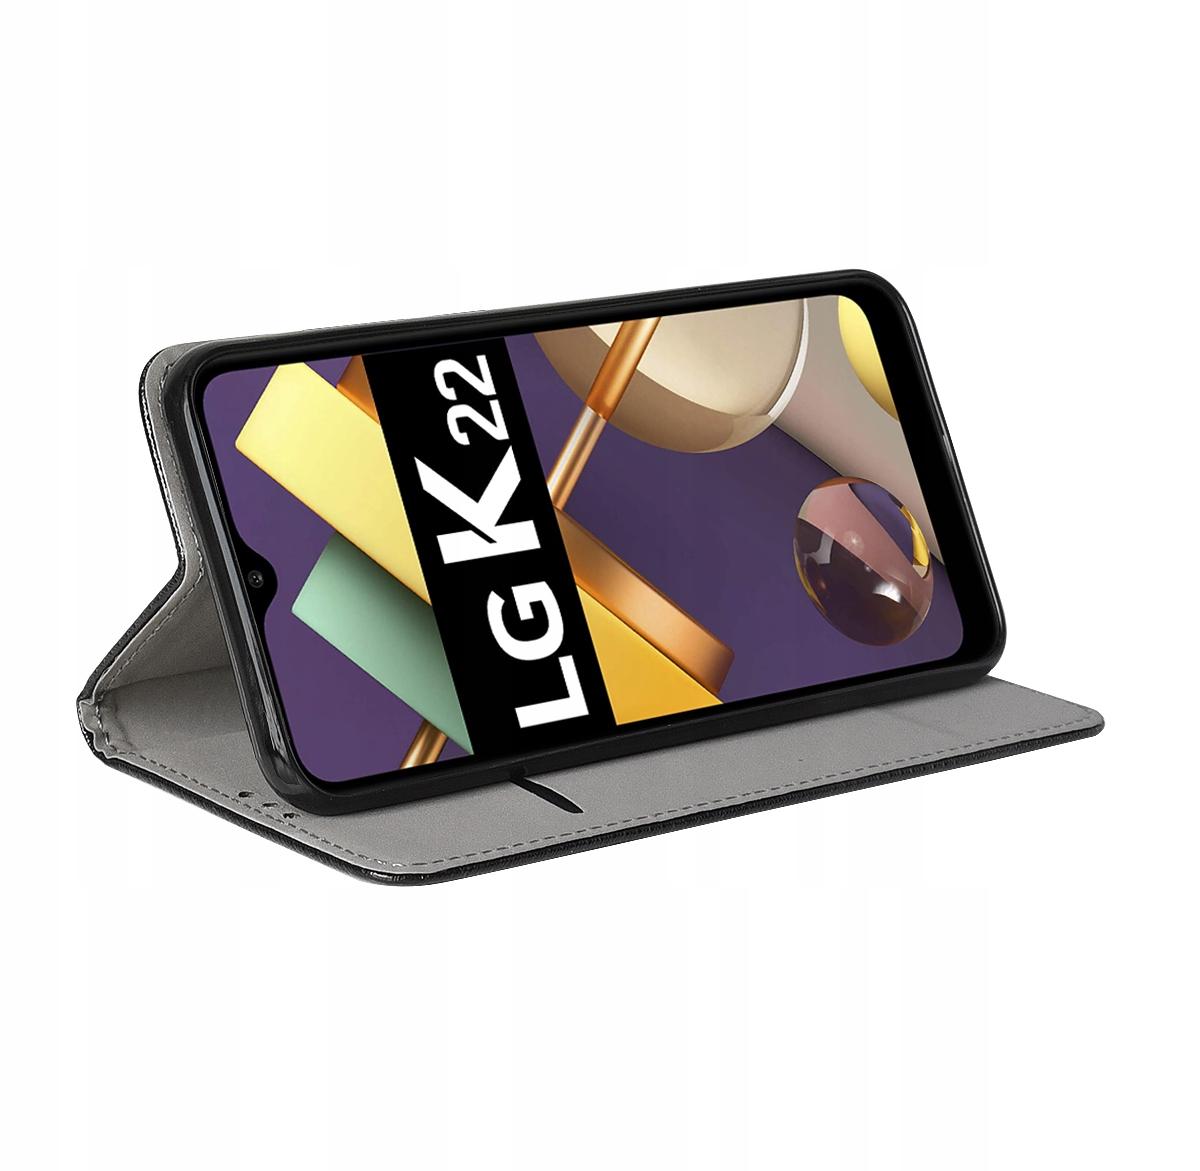 Etui do LG K22 Case Magnet Portfel + Szkło 9H Producent Kraina GSM